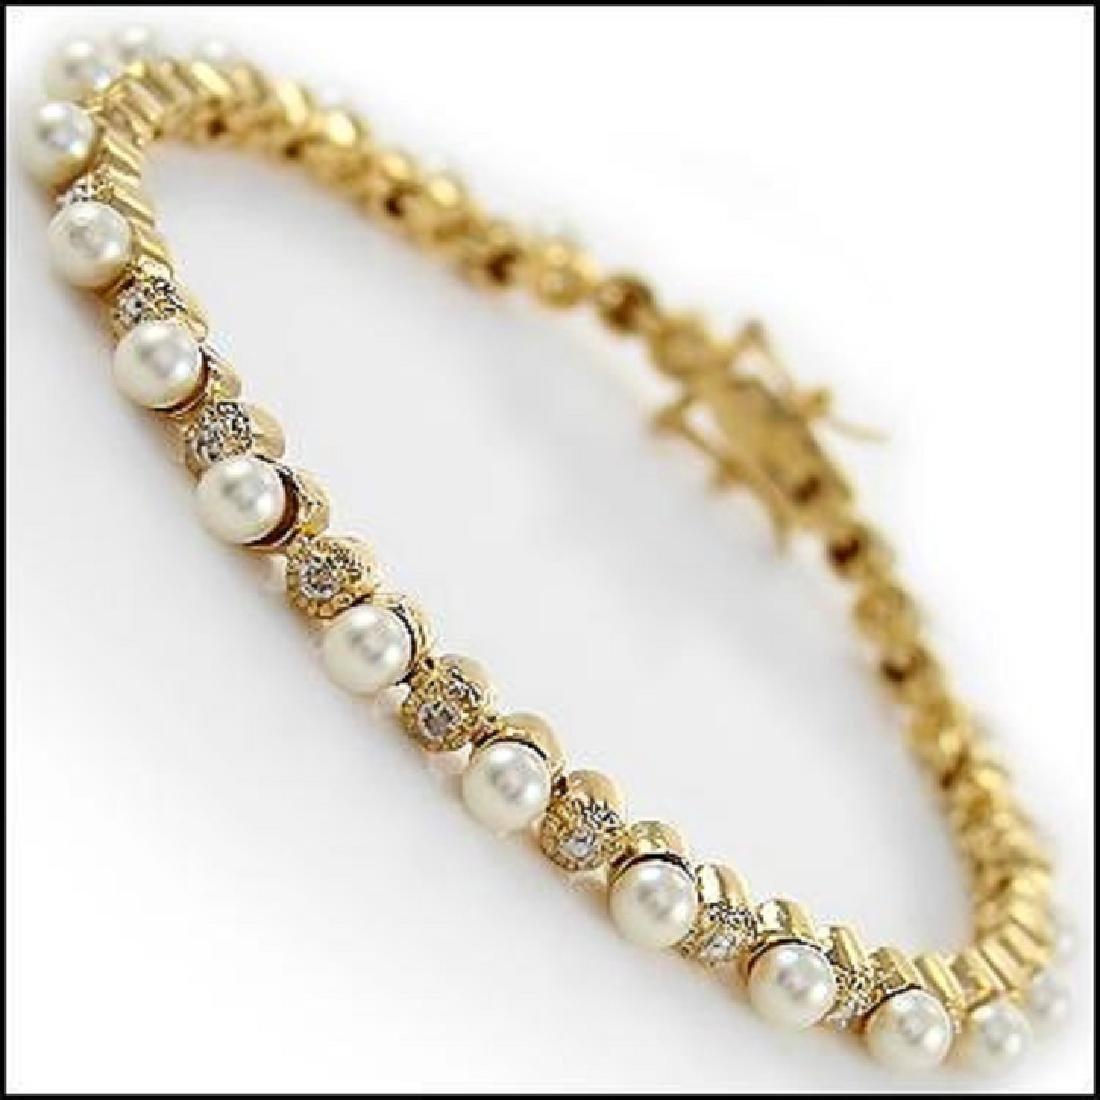 9.84 CT Freshwater Pearl & Diamond Bracelet $1455